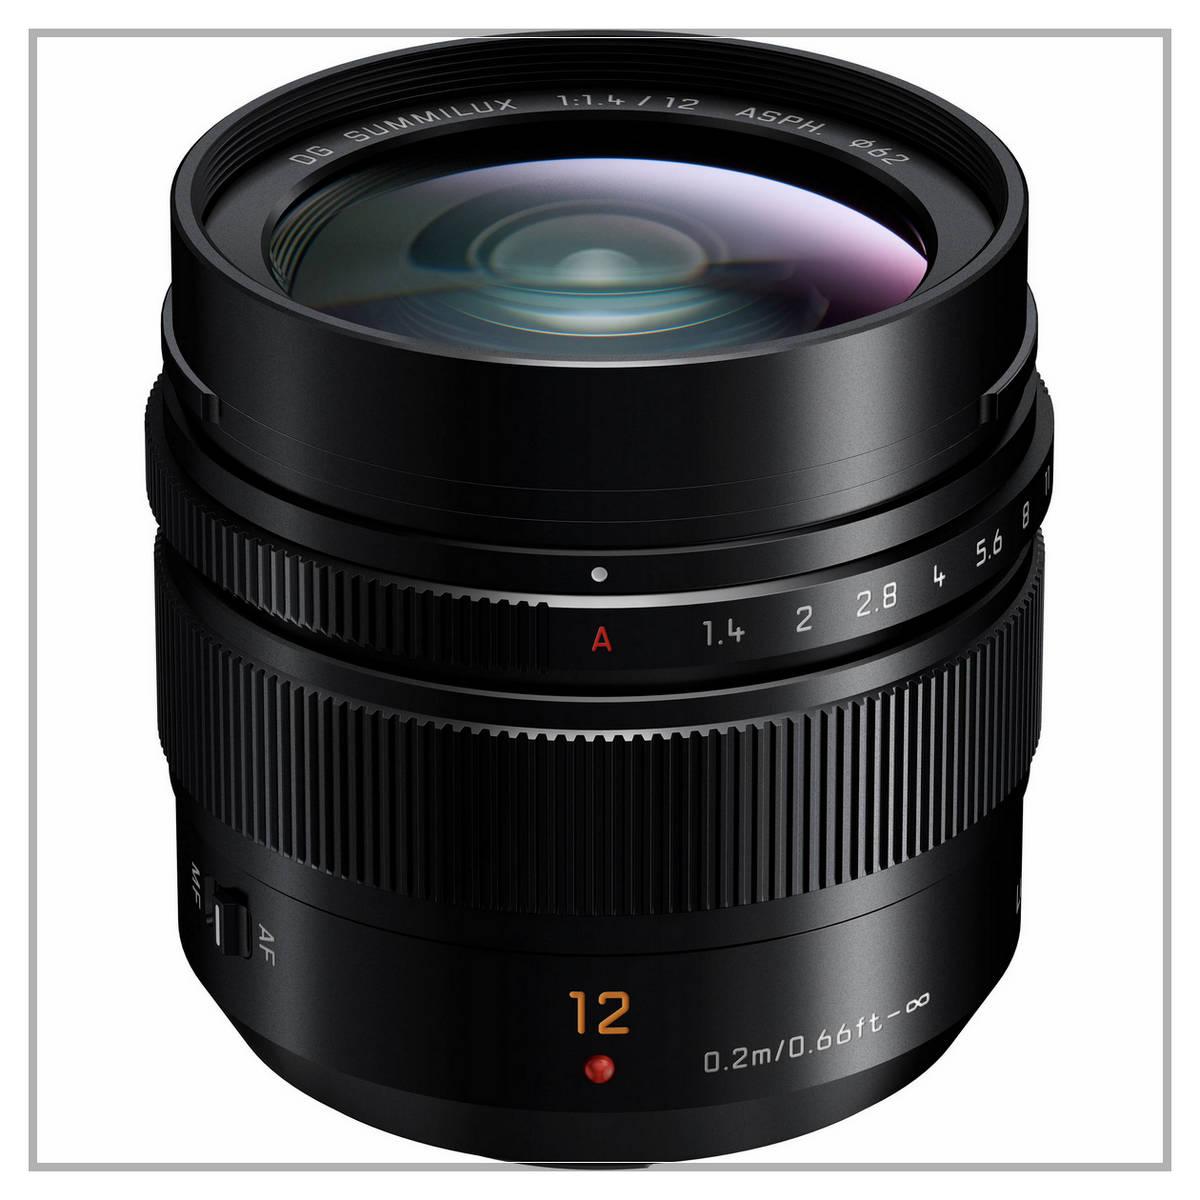 Panasonic-Leica Summilux 12 f1.4